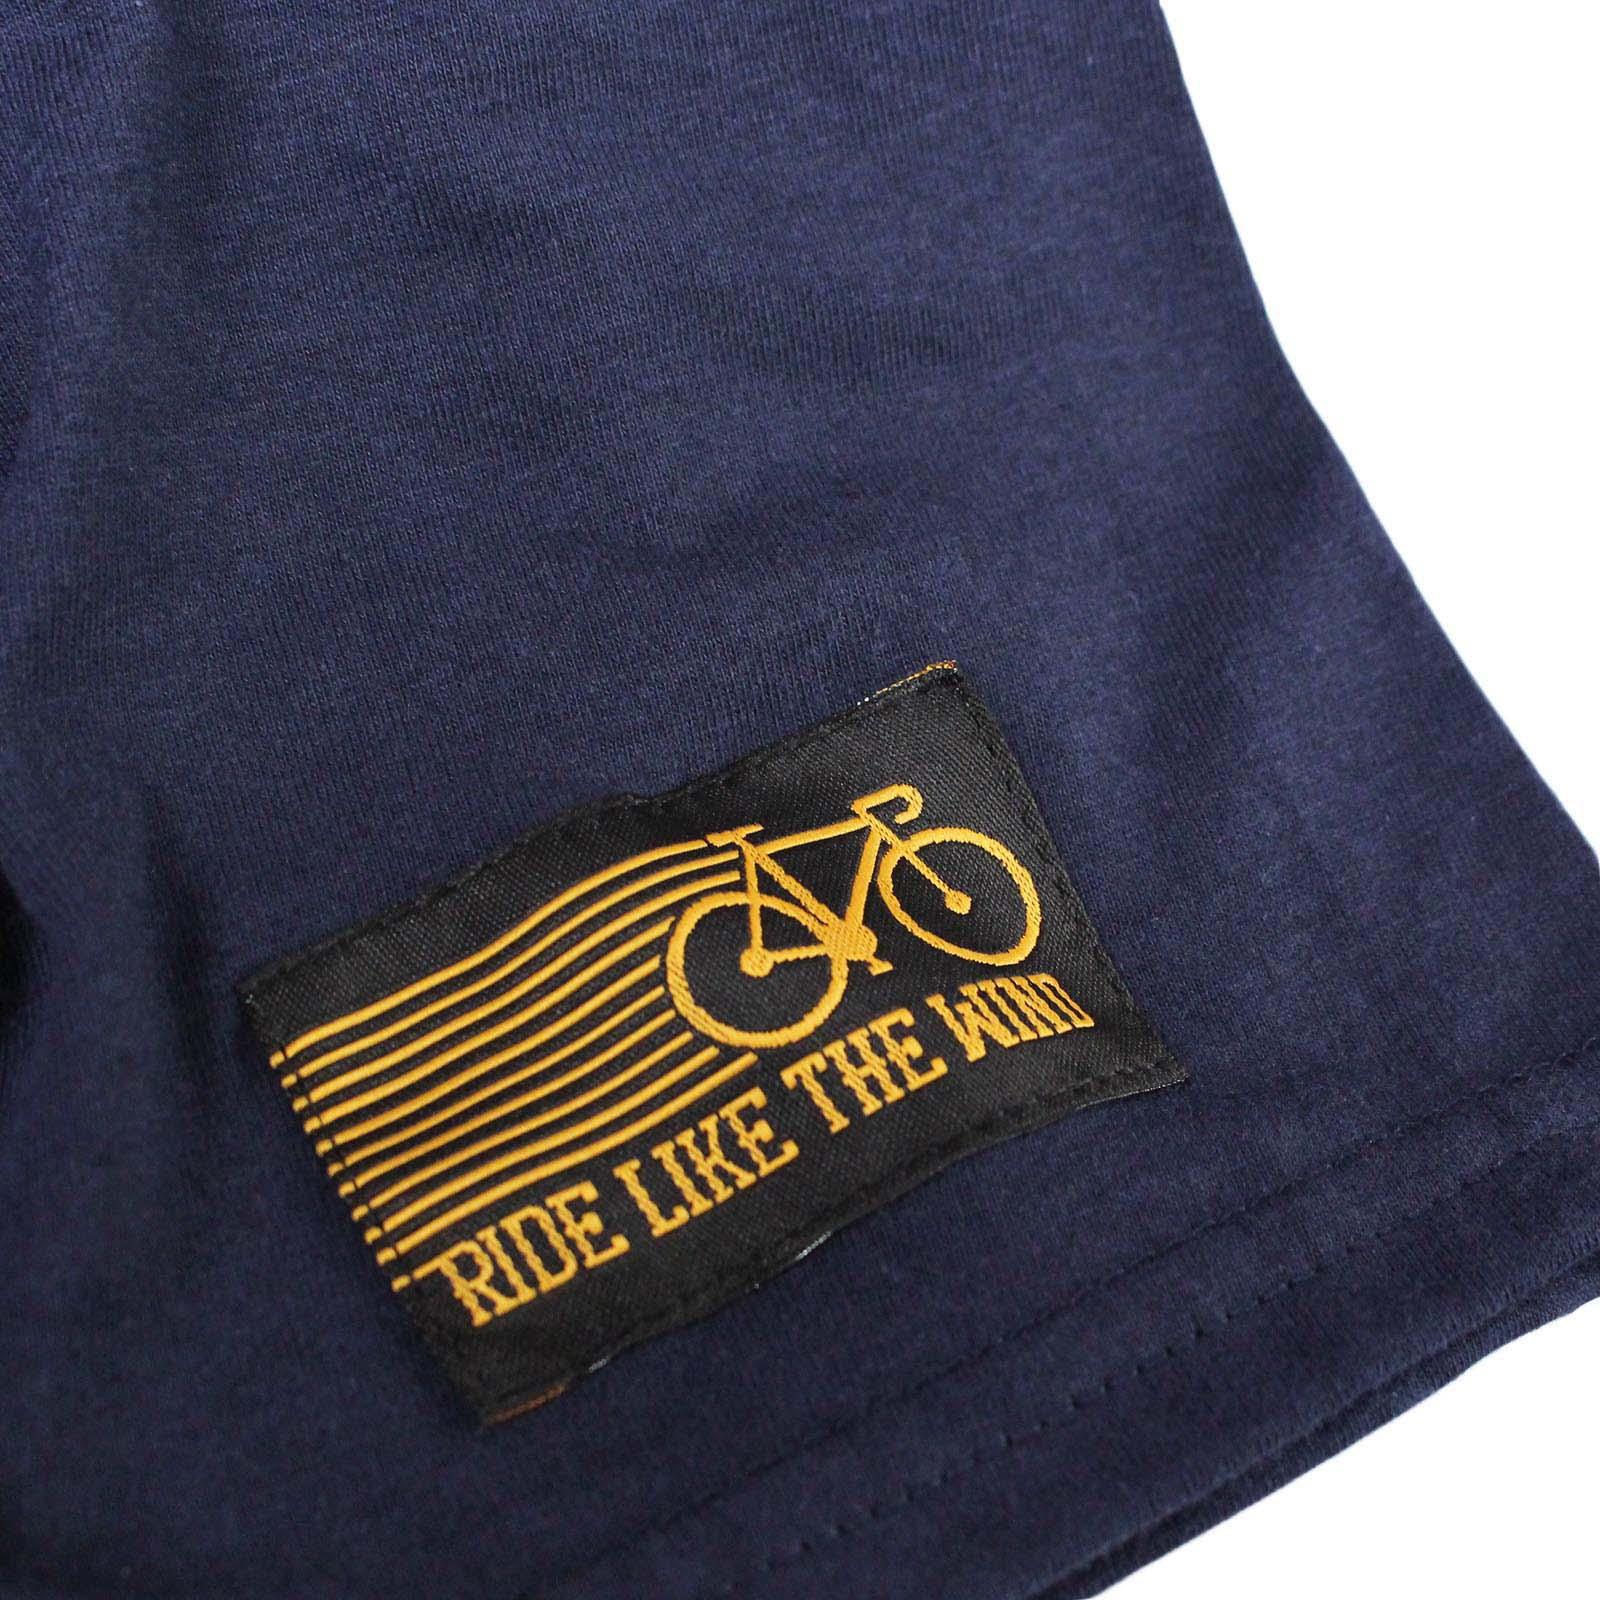 Cycling-Yeah-My-Bike-Did-Cost-More-funny-top-Birthday-tee-T-SHIRT-T-SHIRT thumbnail 21